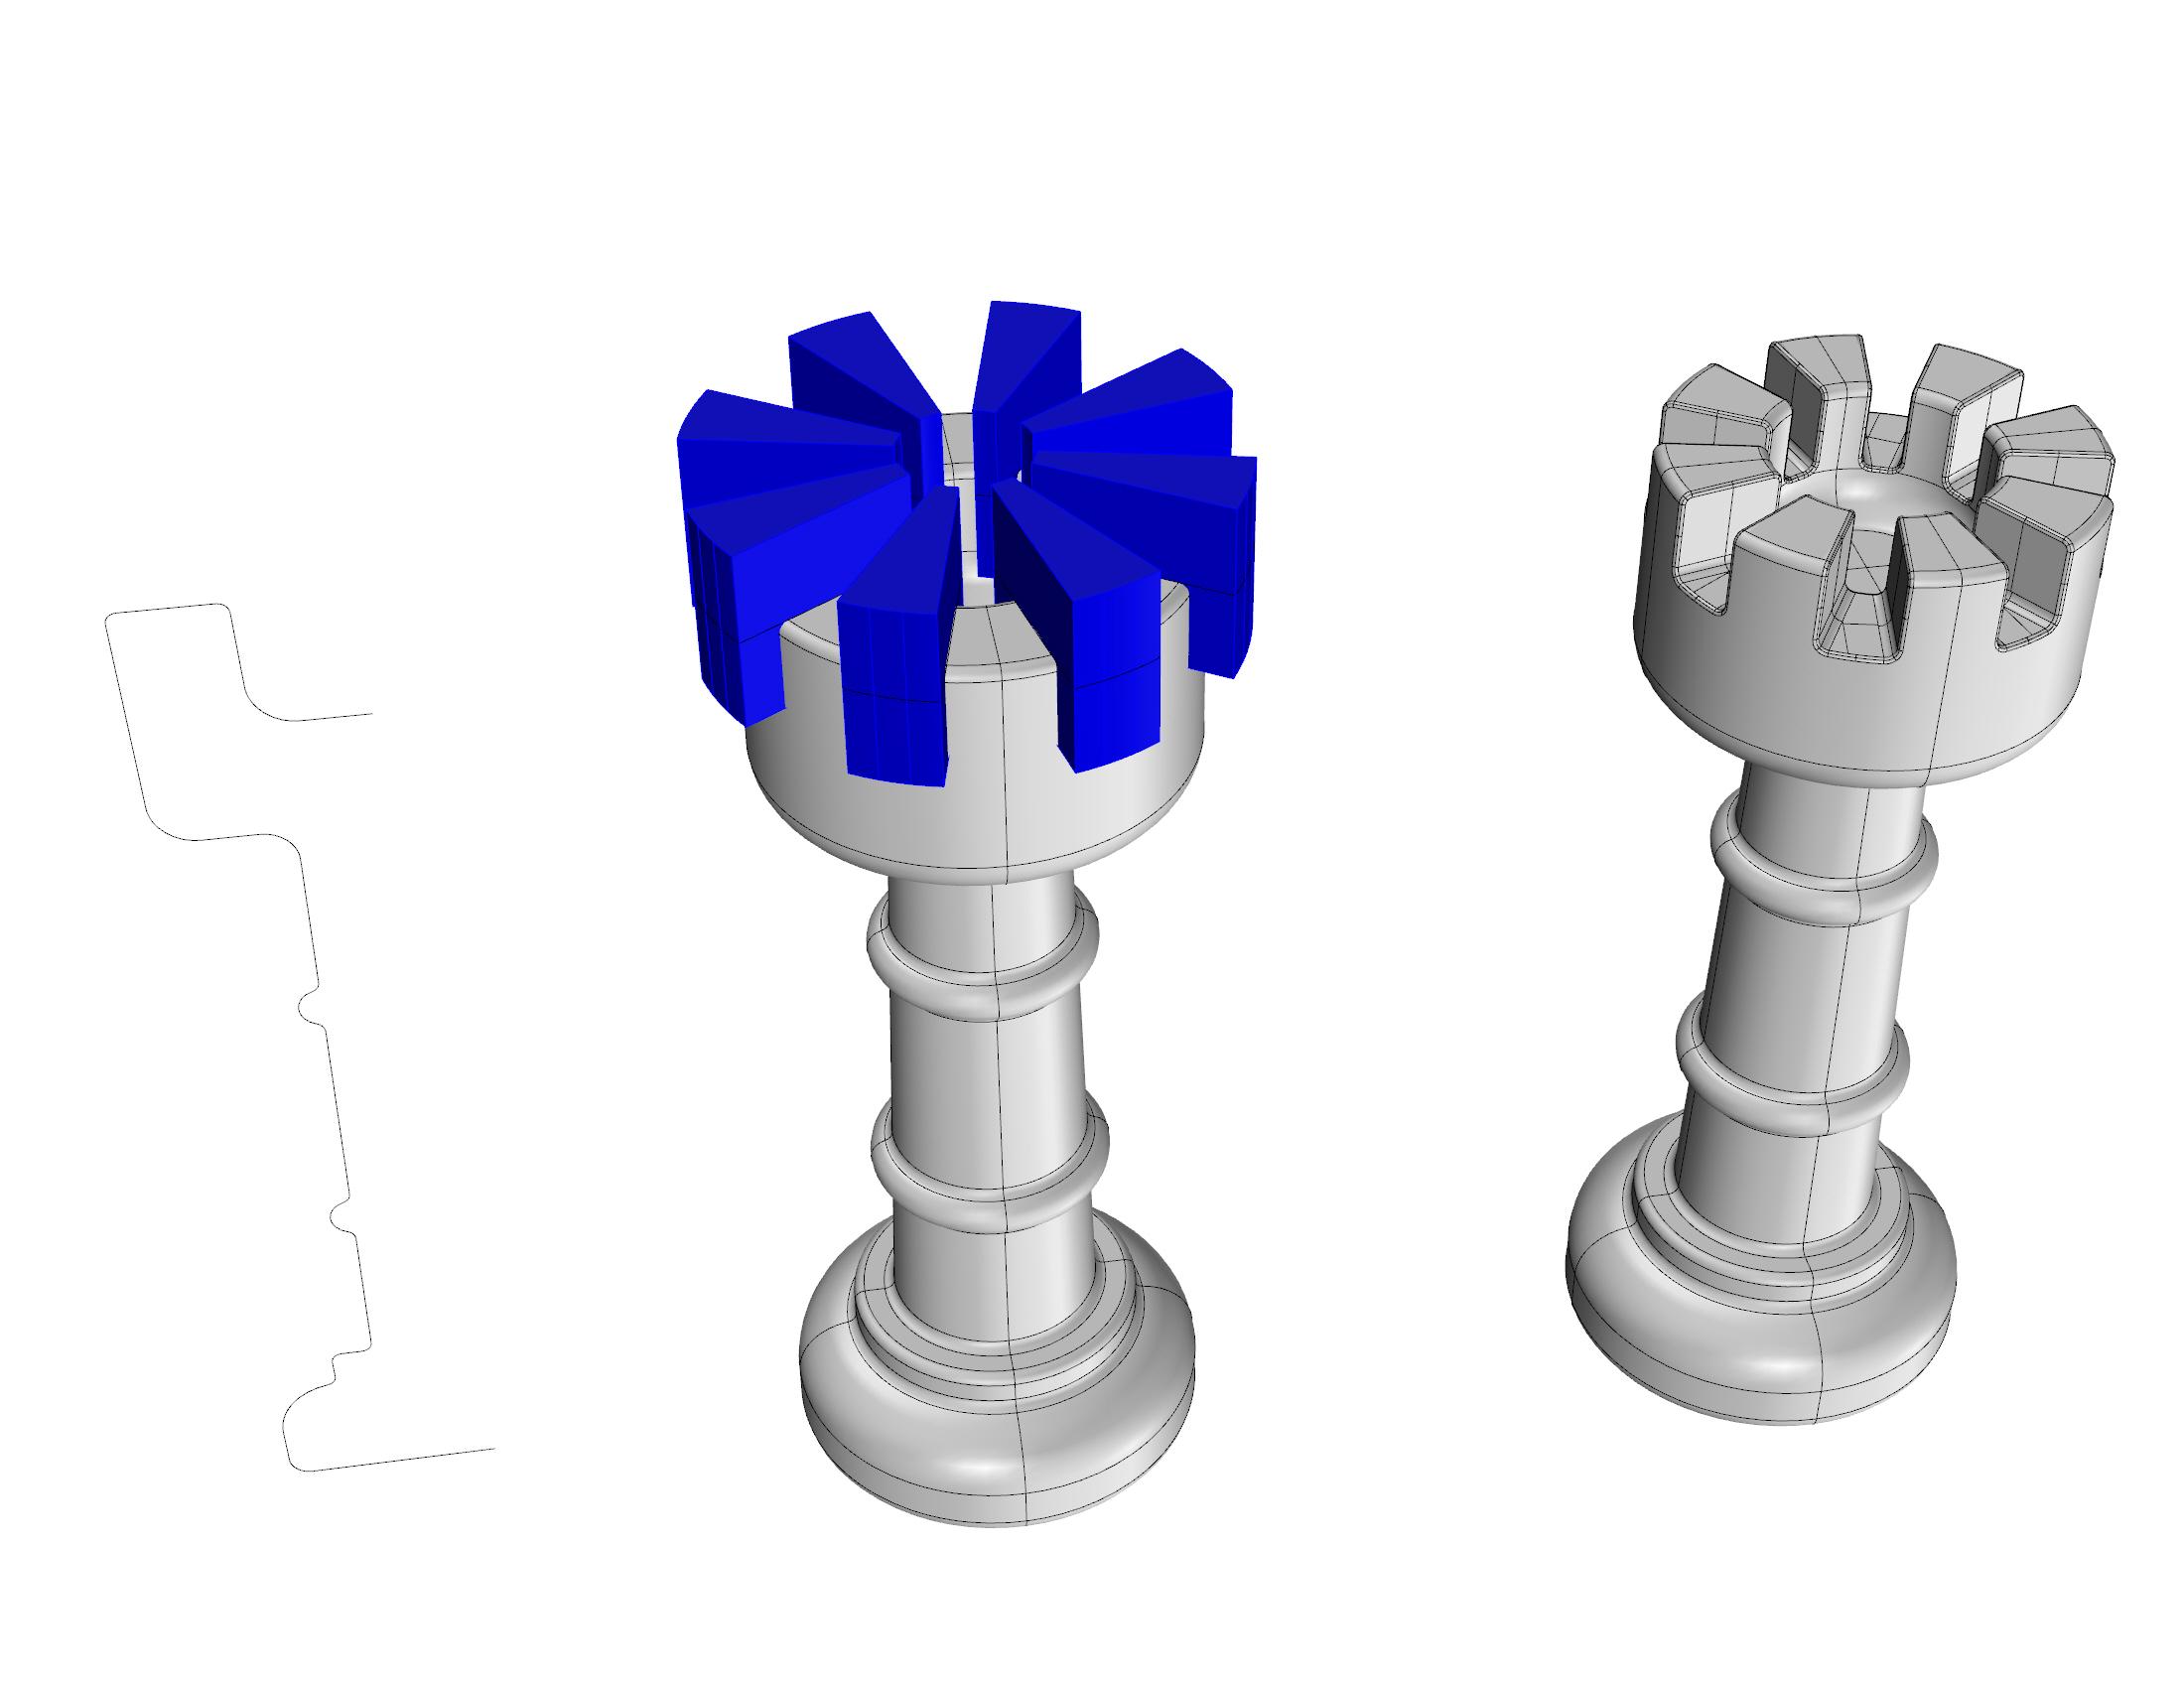 torre-scacchi.jpg